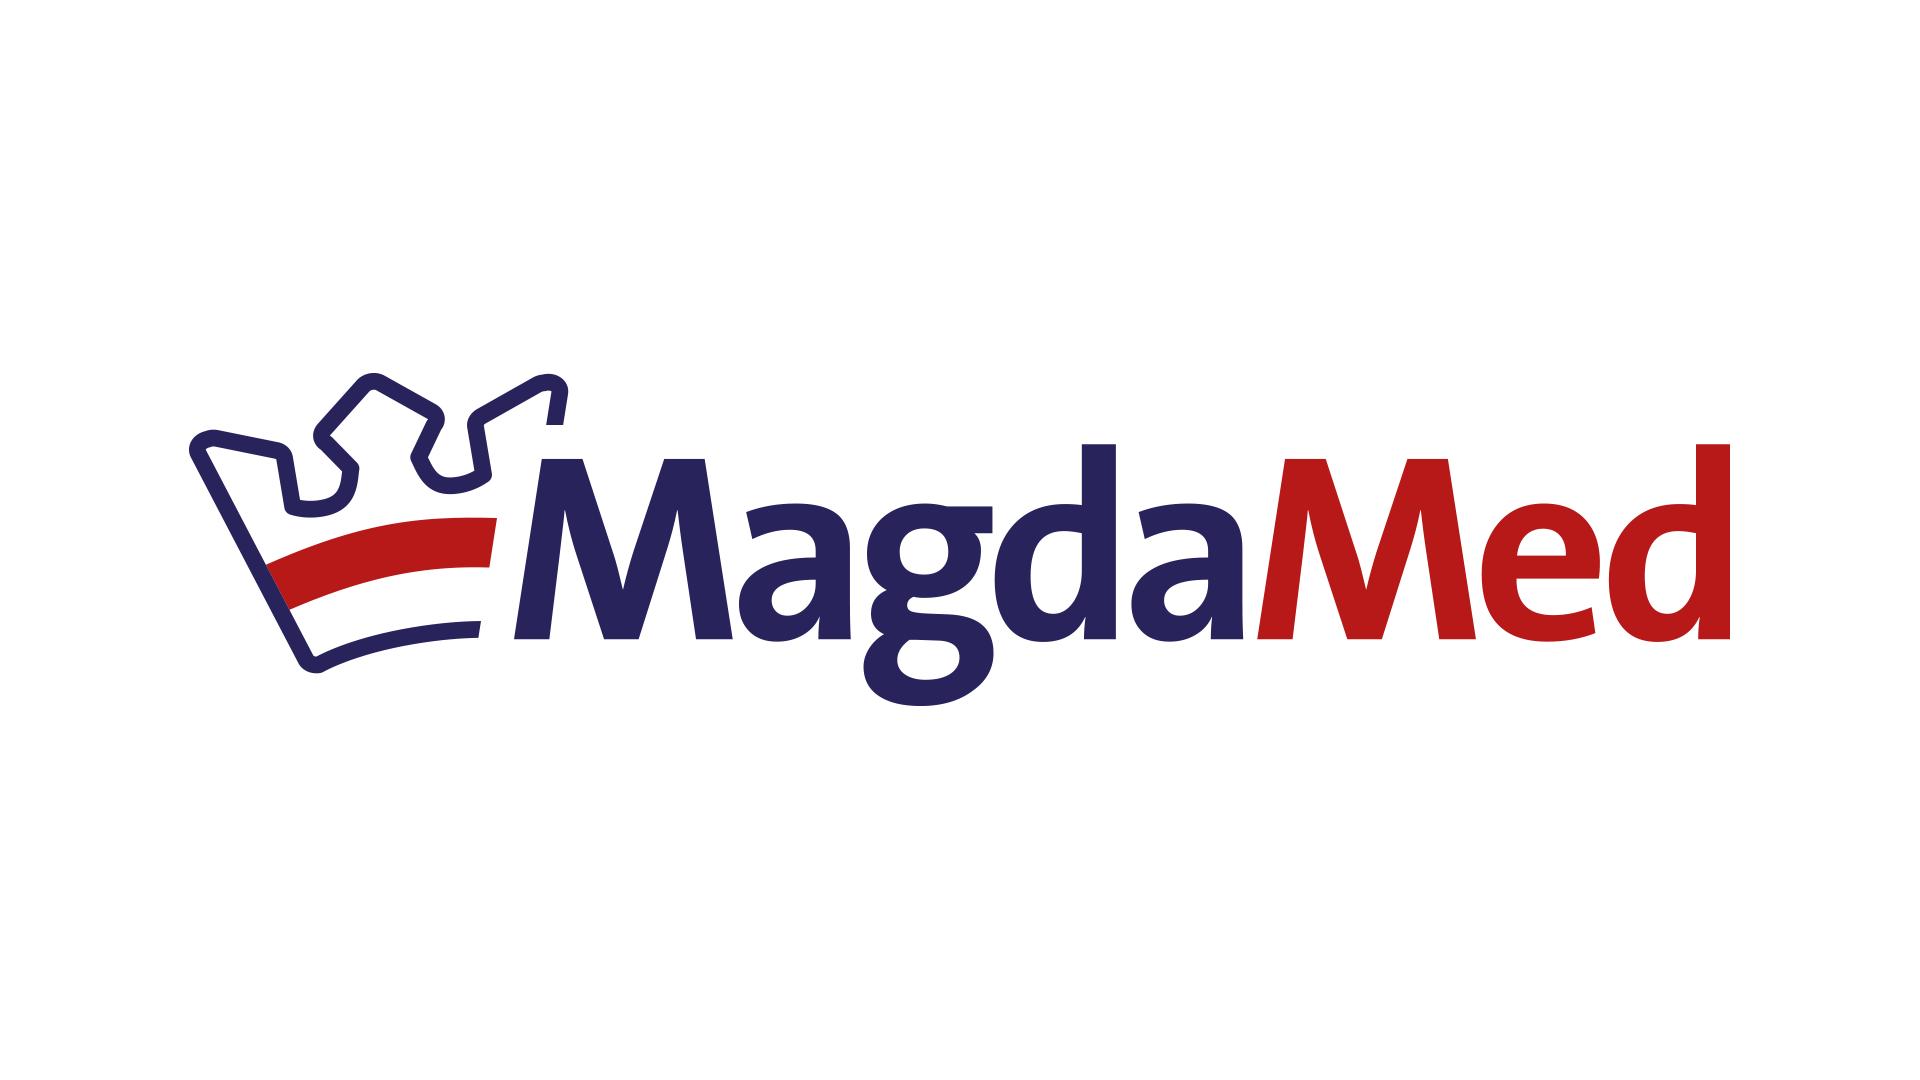 magdamed